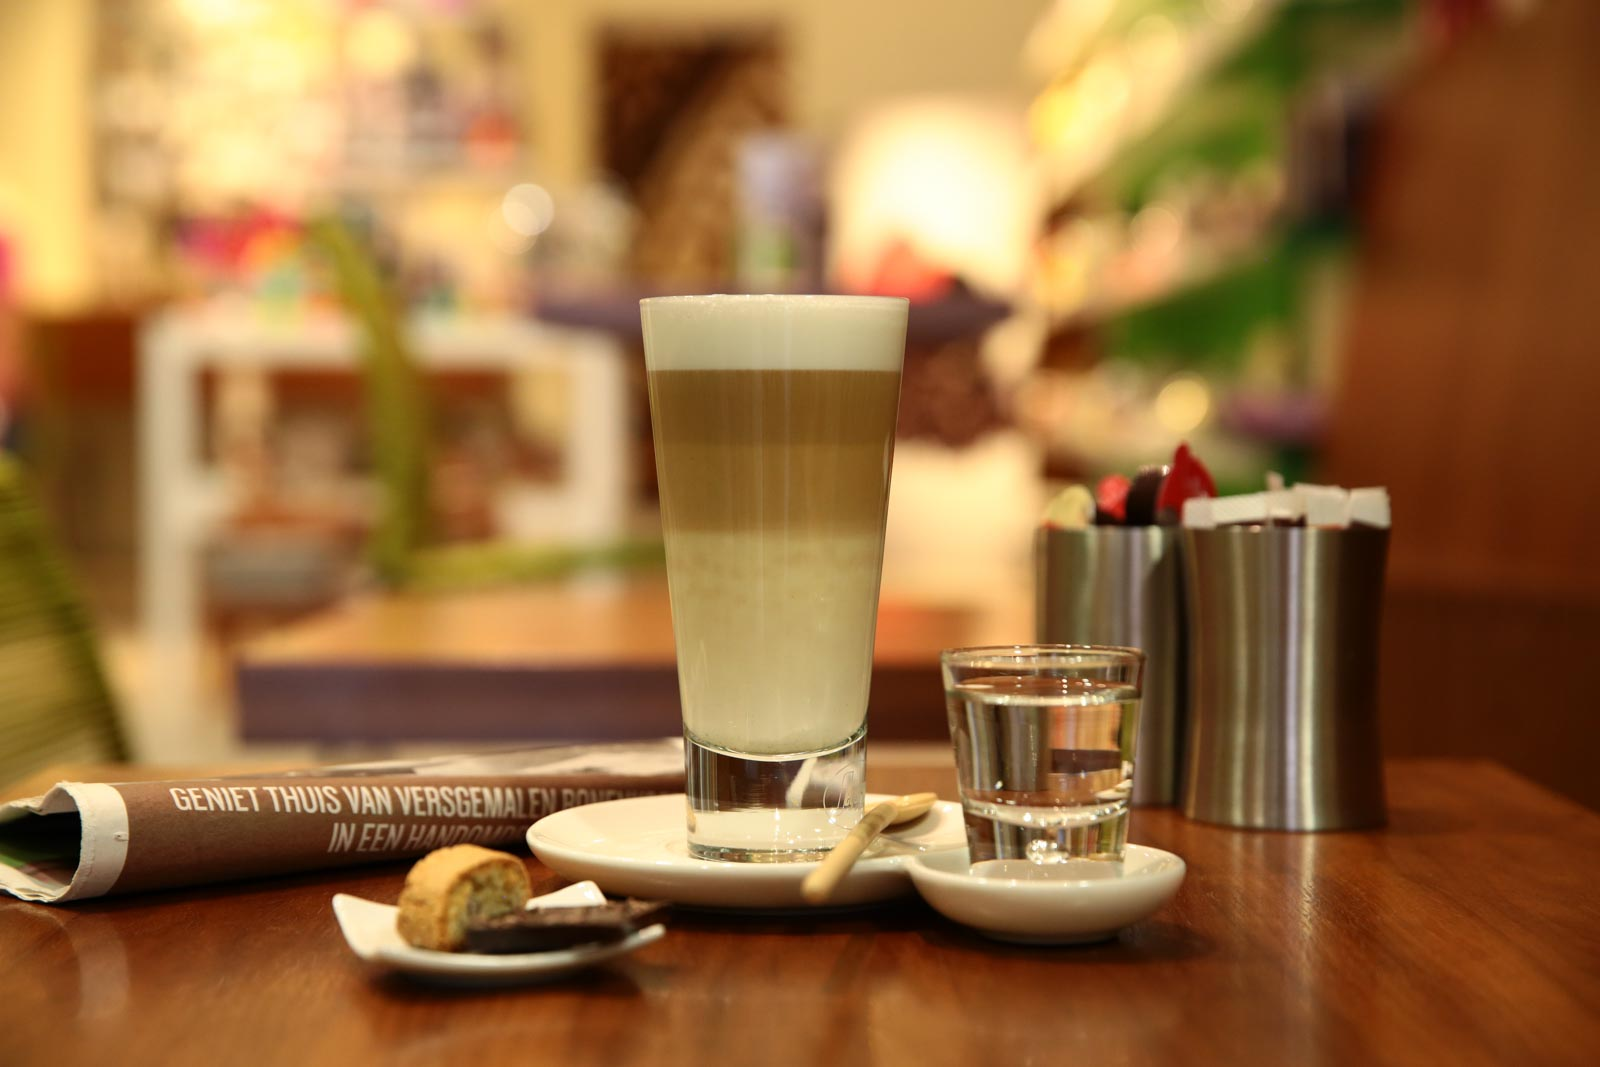 Sfeerfoto gemaakt bij Caffe Dono